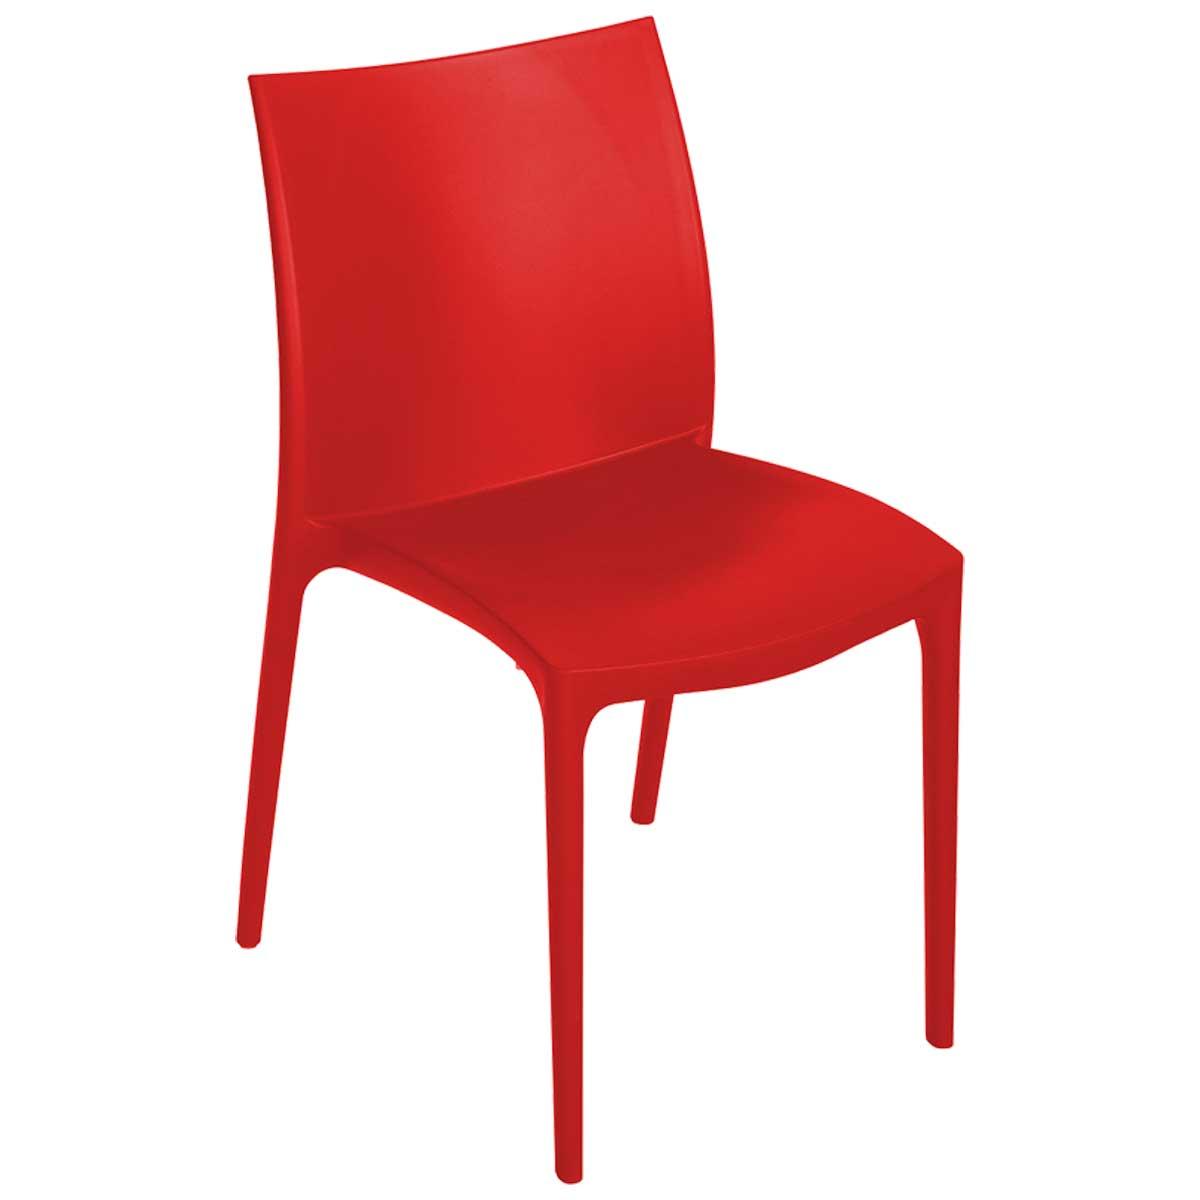 kromy c rouge 01 - https://www.werzalit.com/es/producto/kromy-stuhl/